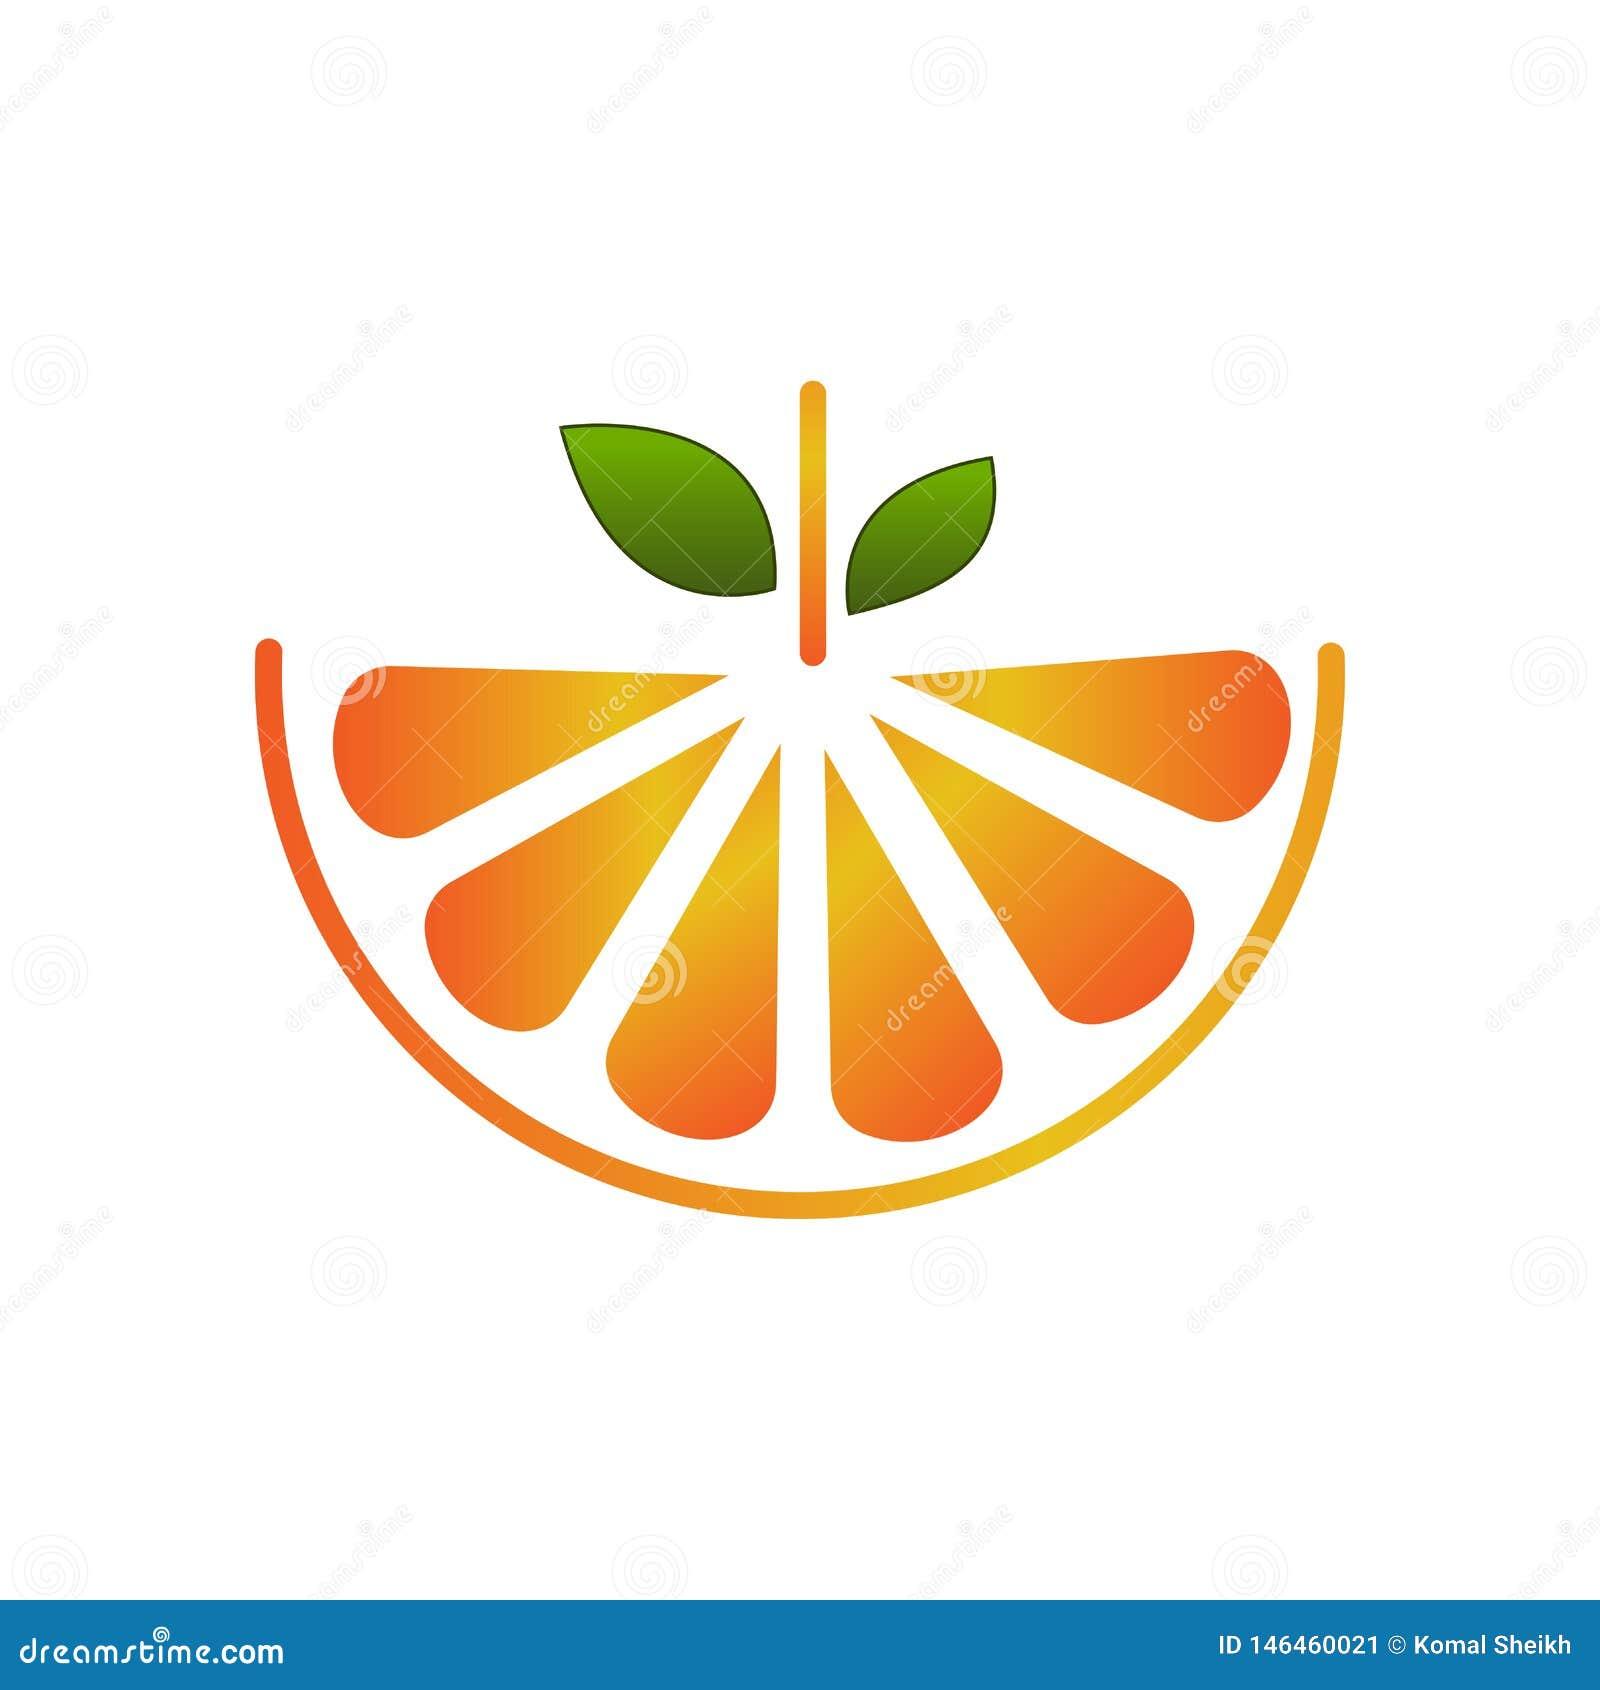 Vector fruit logo creative orange slice design illustration